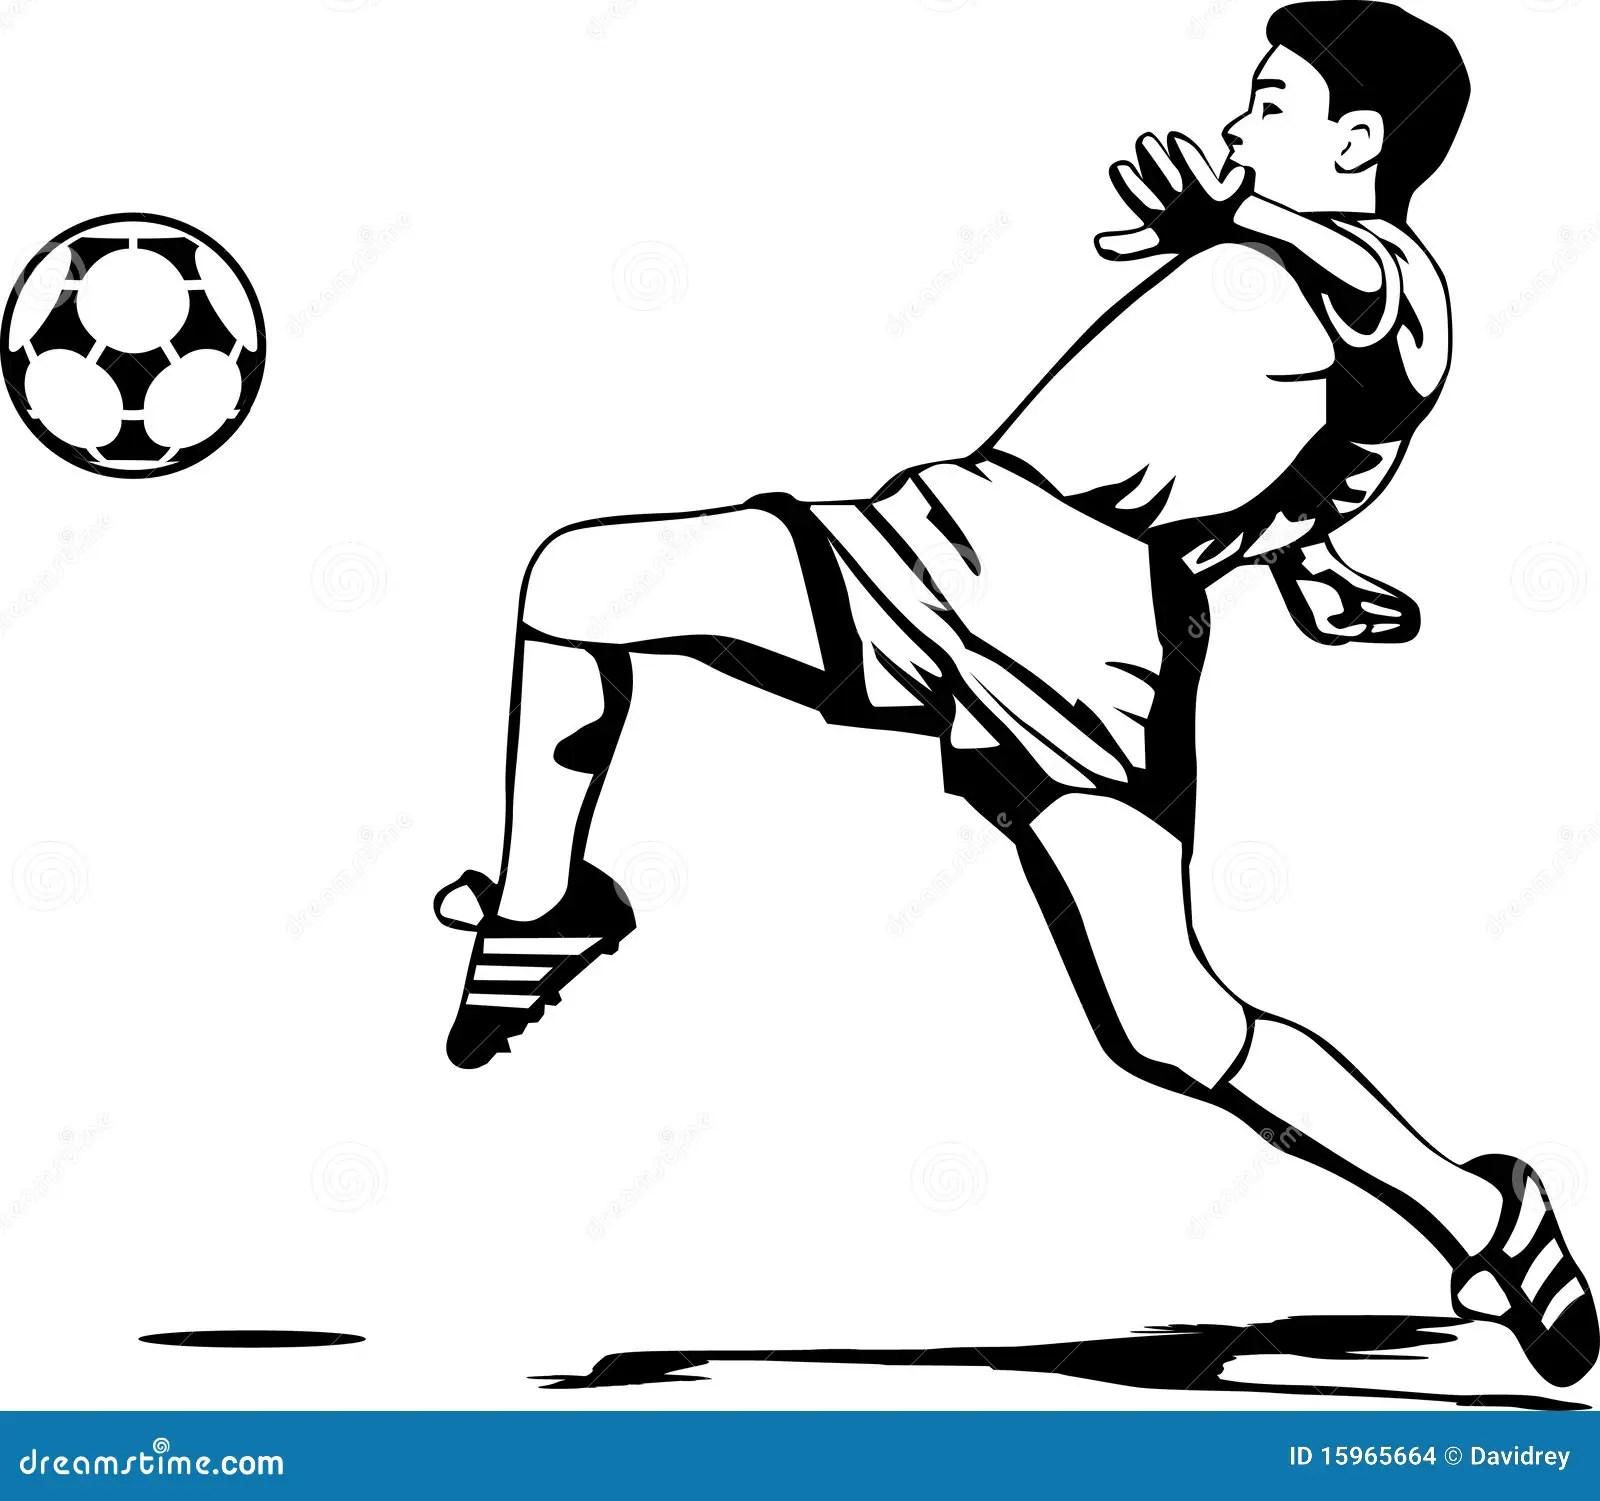 Soccer Player Stock Vector Illustration Of Clipart